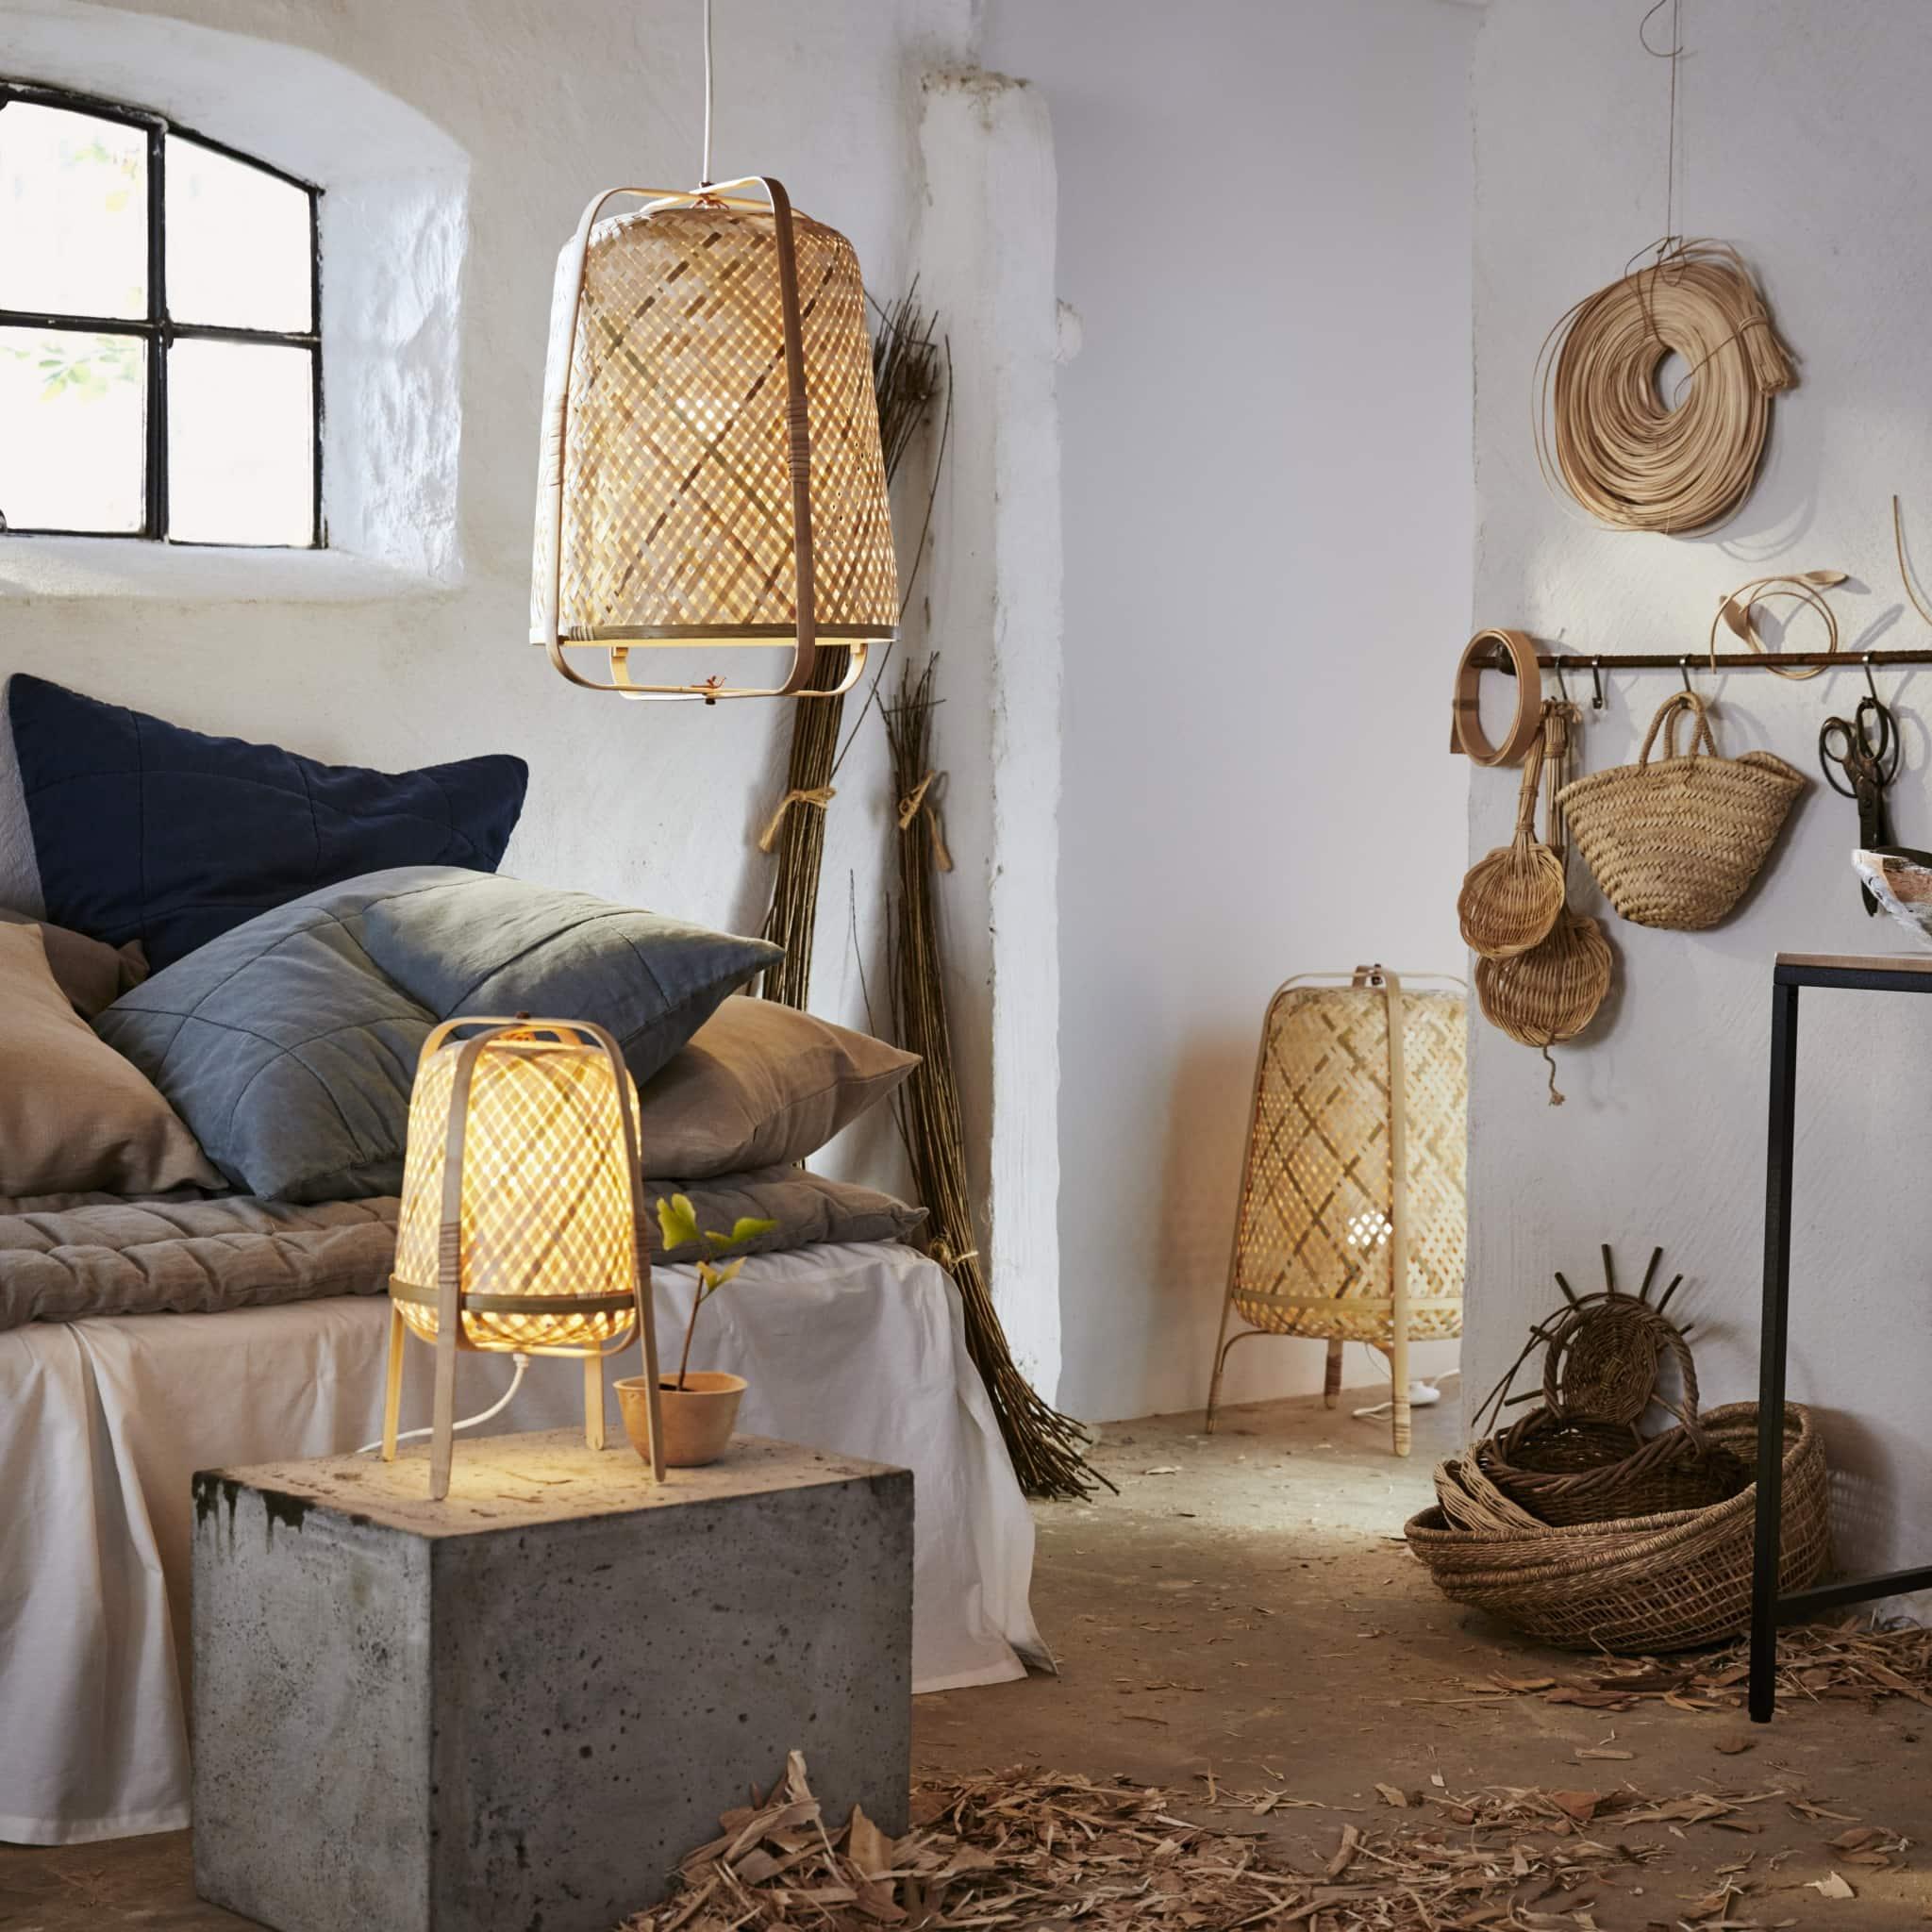 duurzame ikea lampen van bamboe